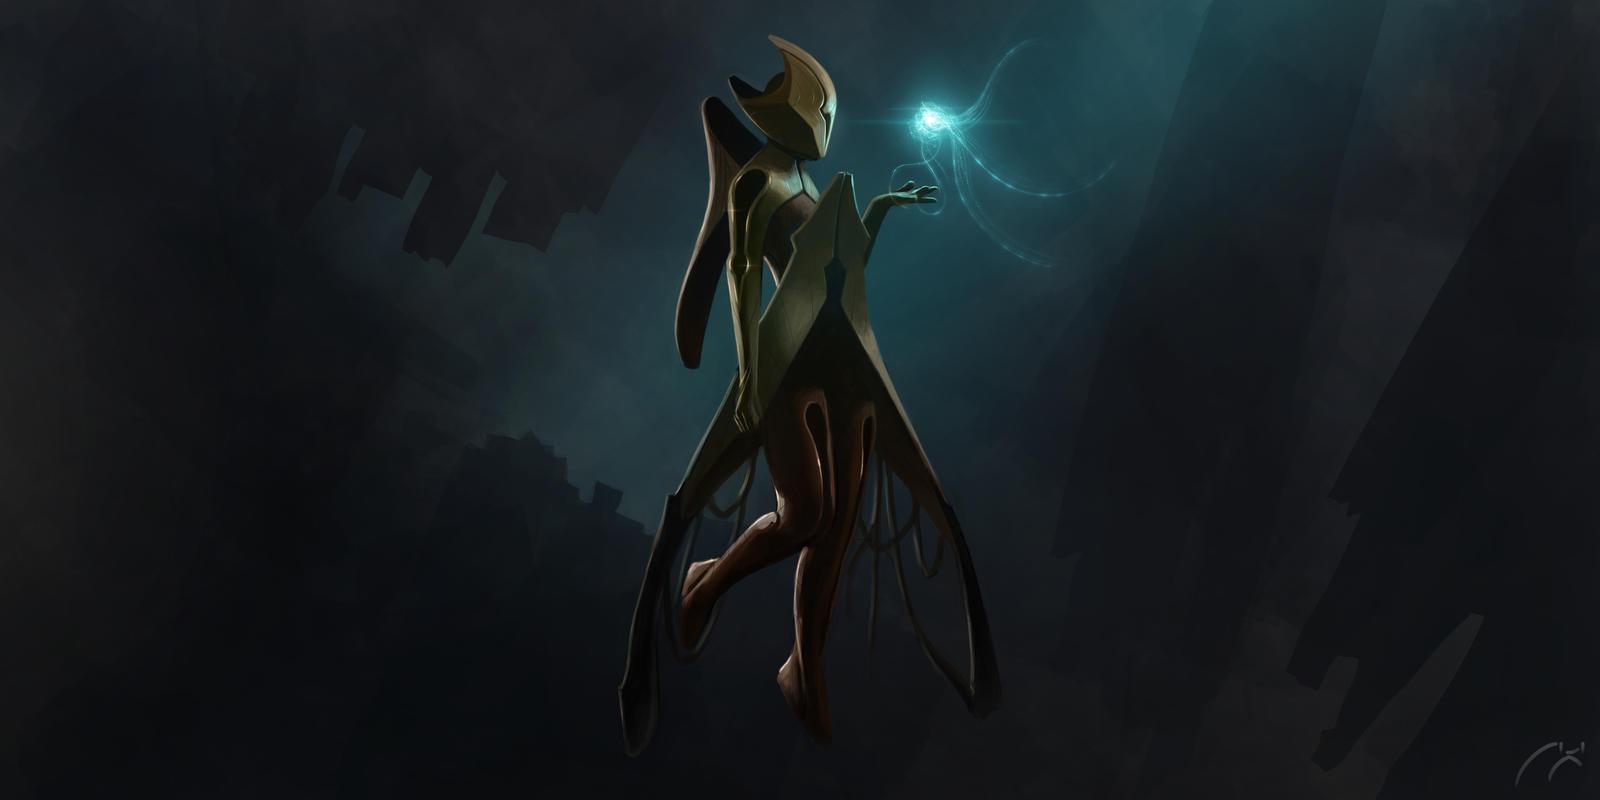 Spirit Temptress by xistenceimaginations